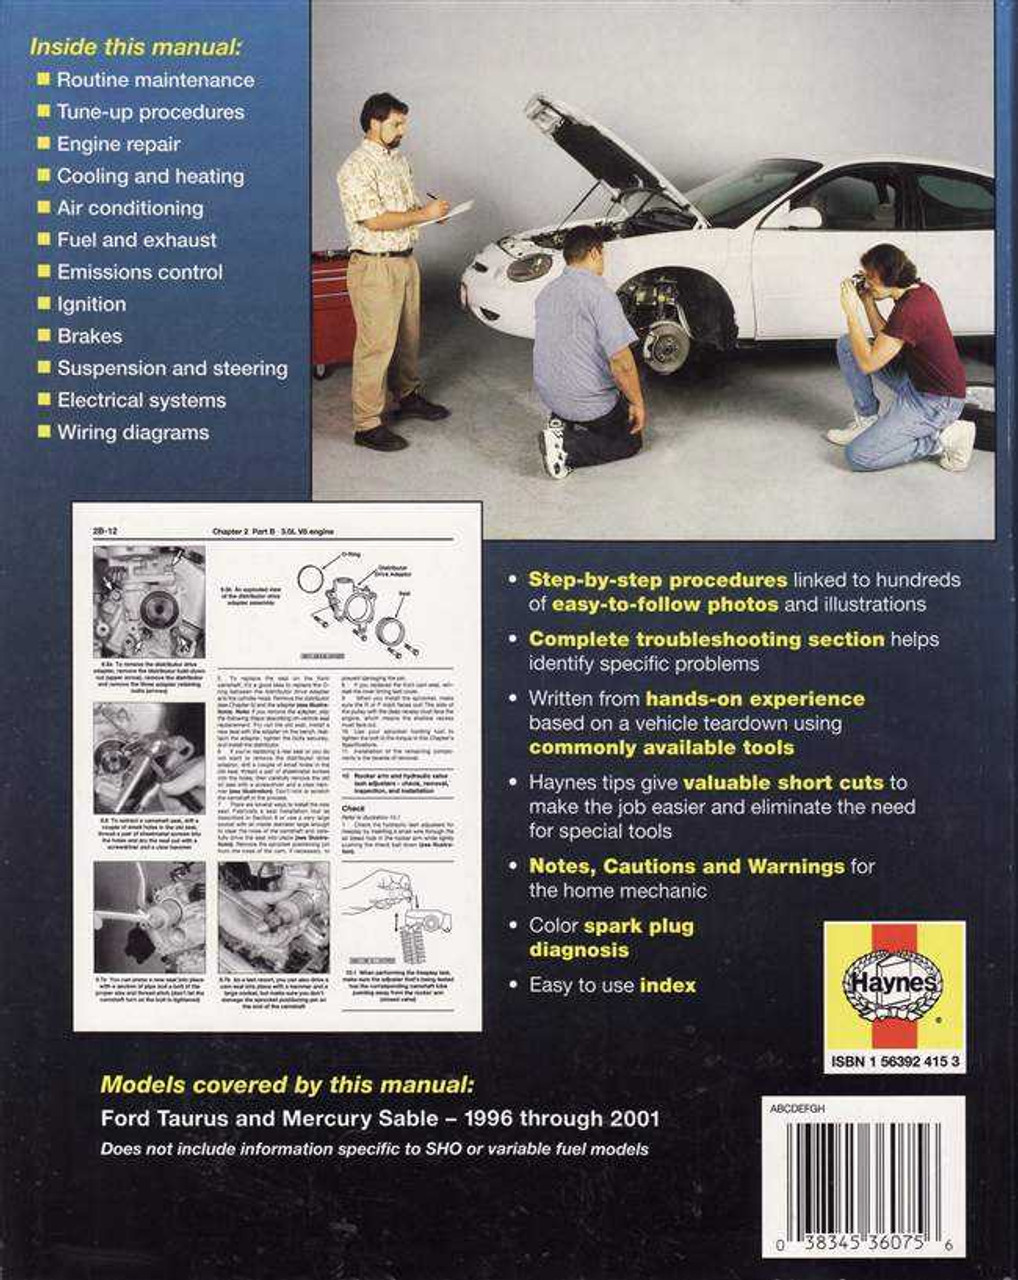 ford taurus and mercury sable 1996 2001 workshop manual 96 mercury sable exhaust diagram [ 1018 x 1280 Pixel ]